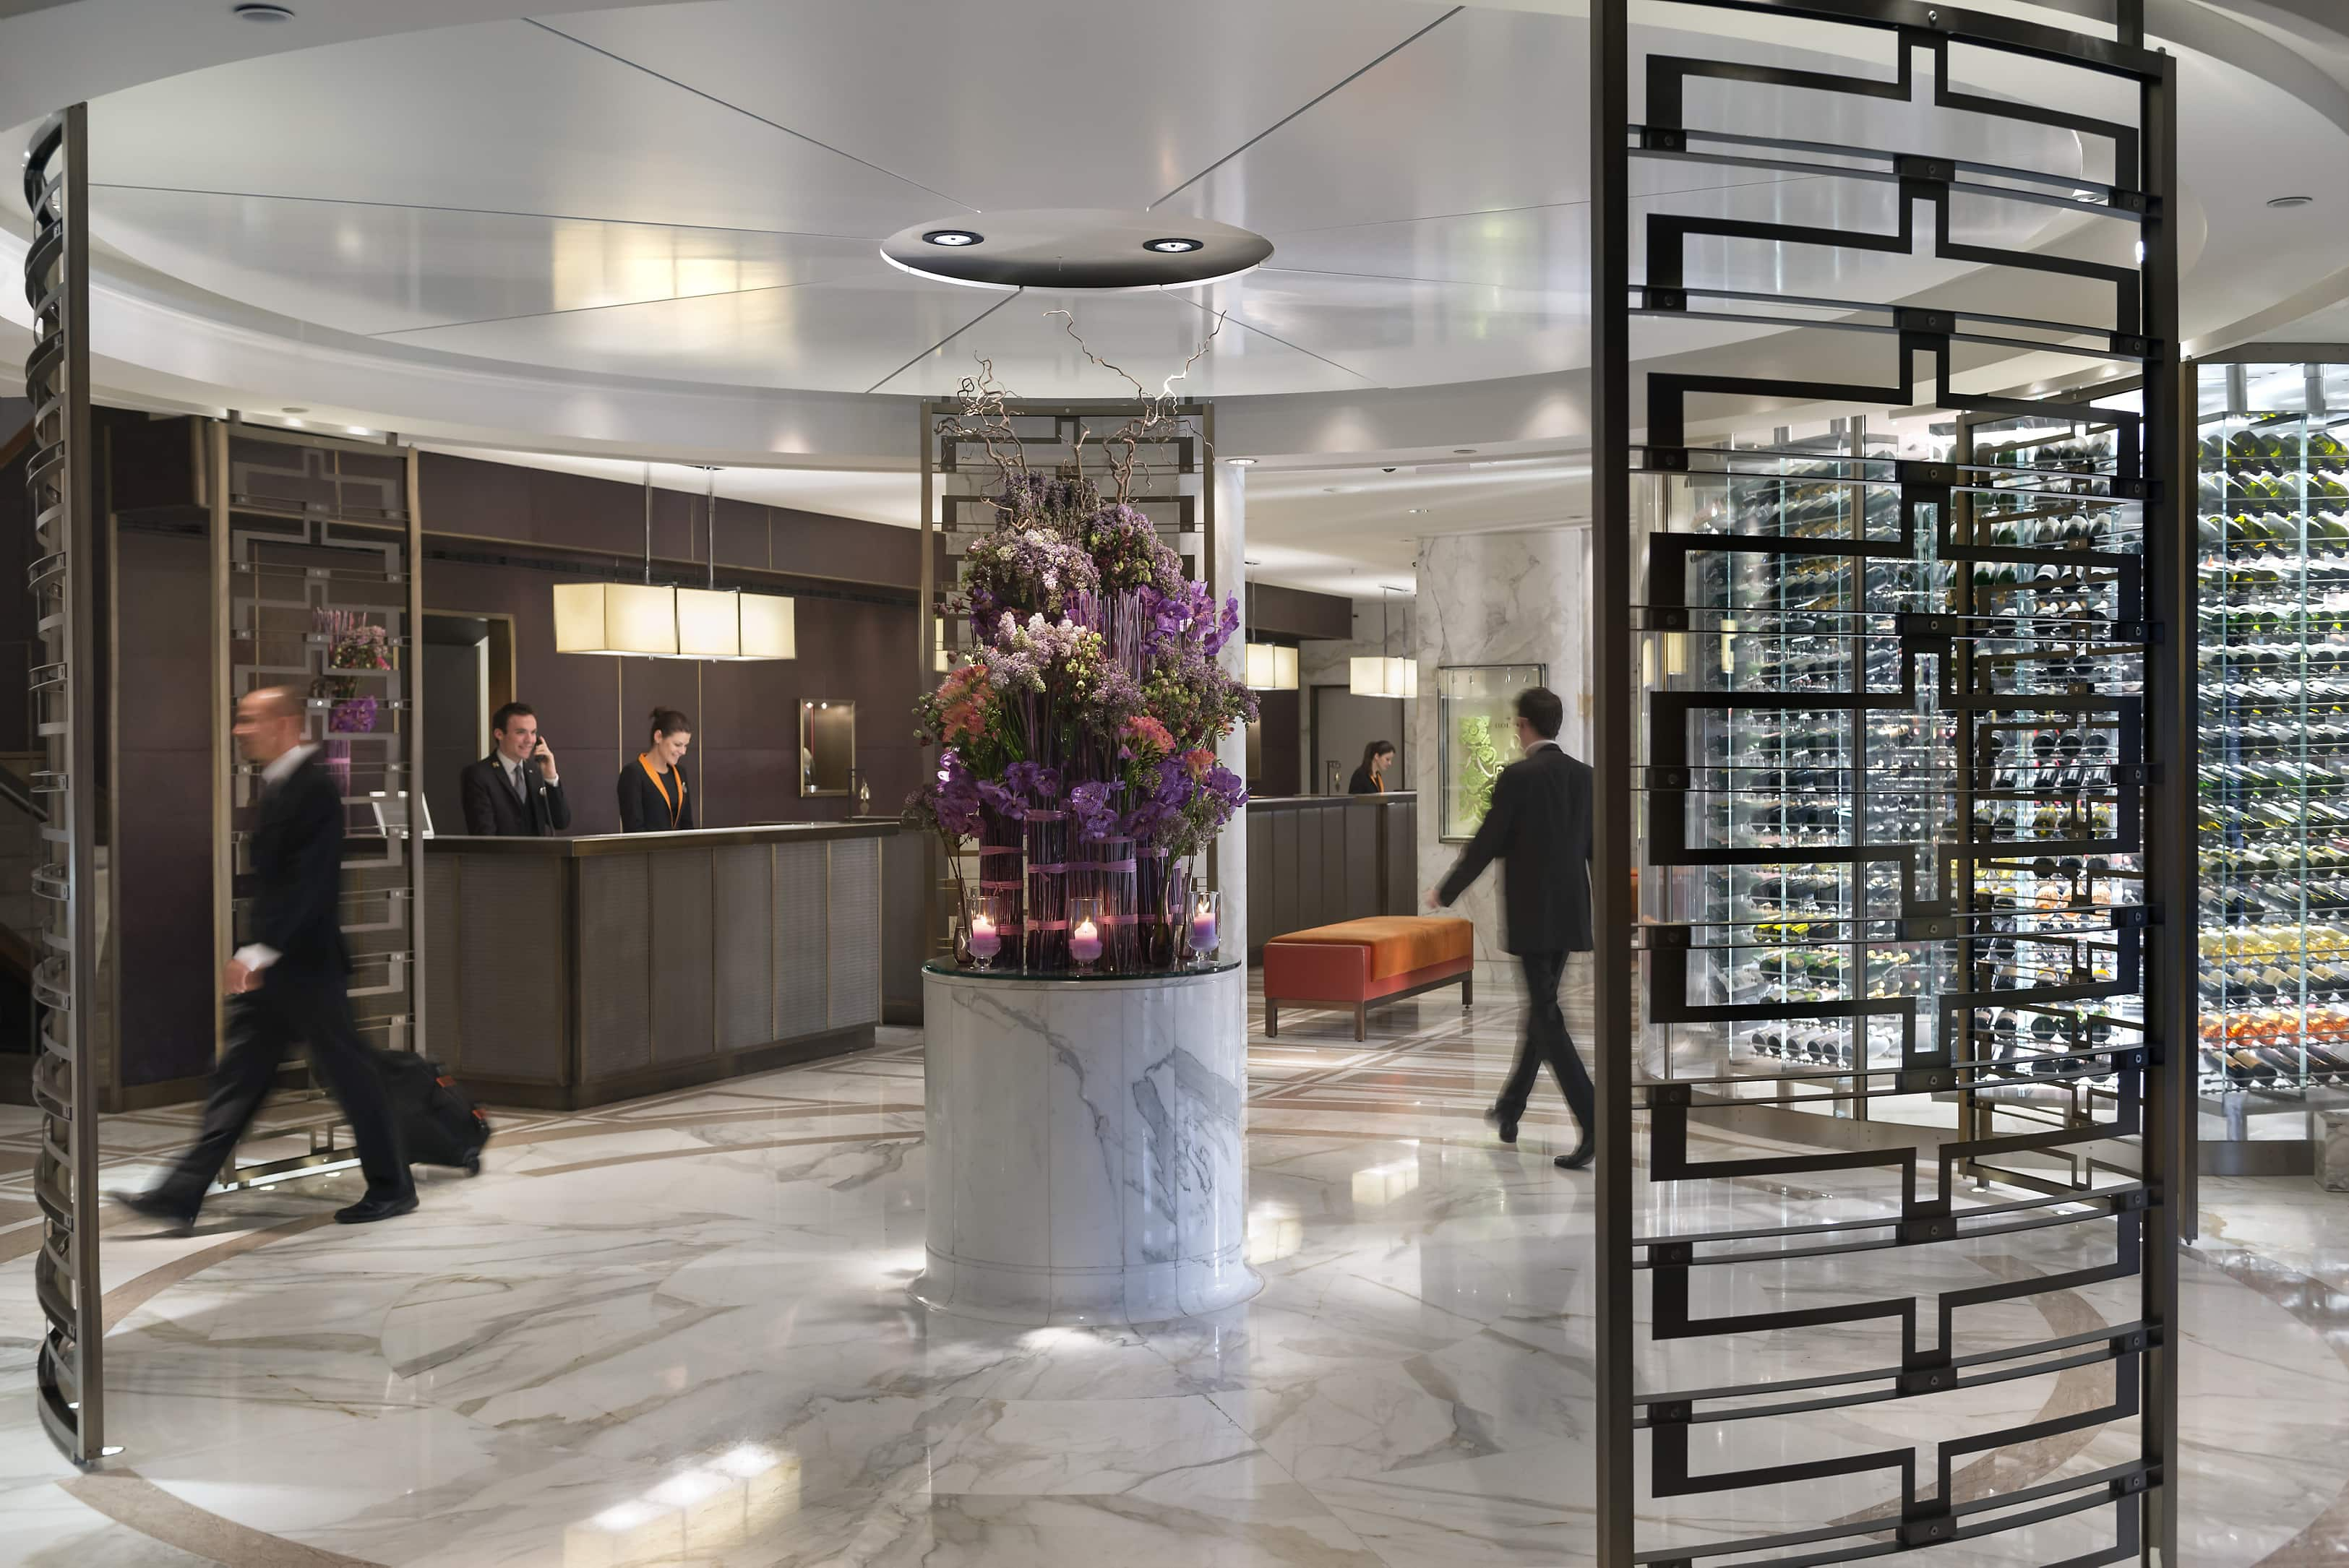 Geneva hotel photo gallery mandarin oriental hotel geneva for Hotels geneve